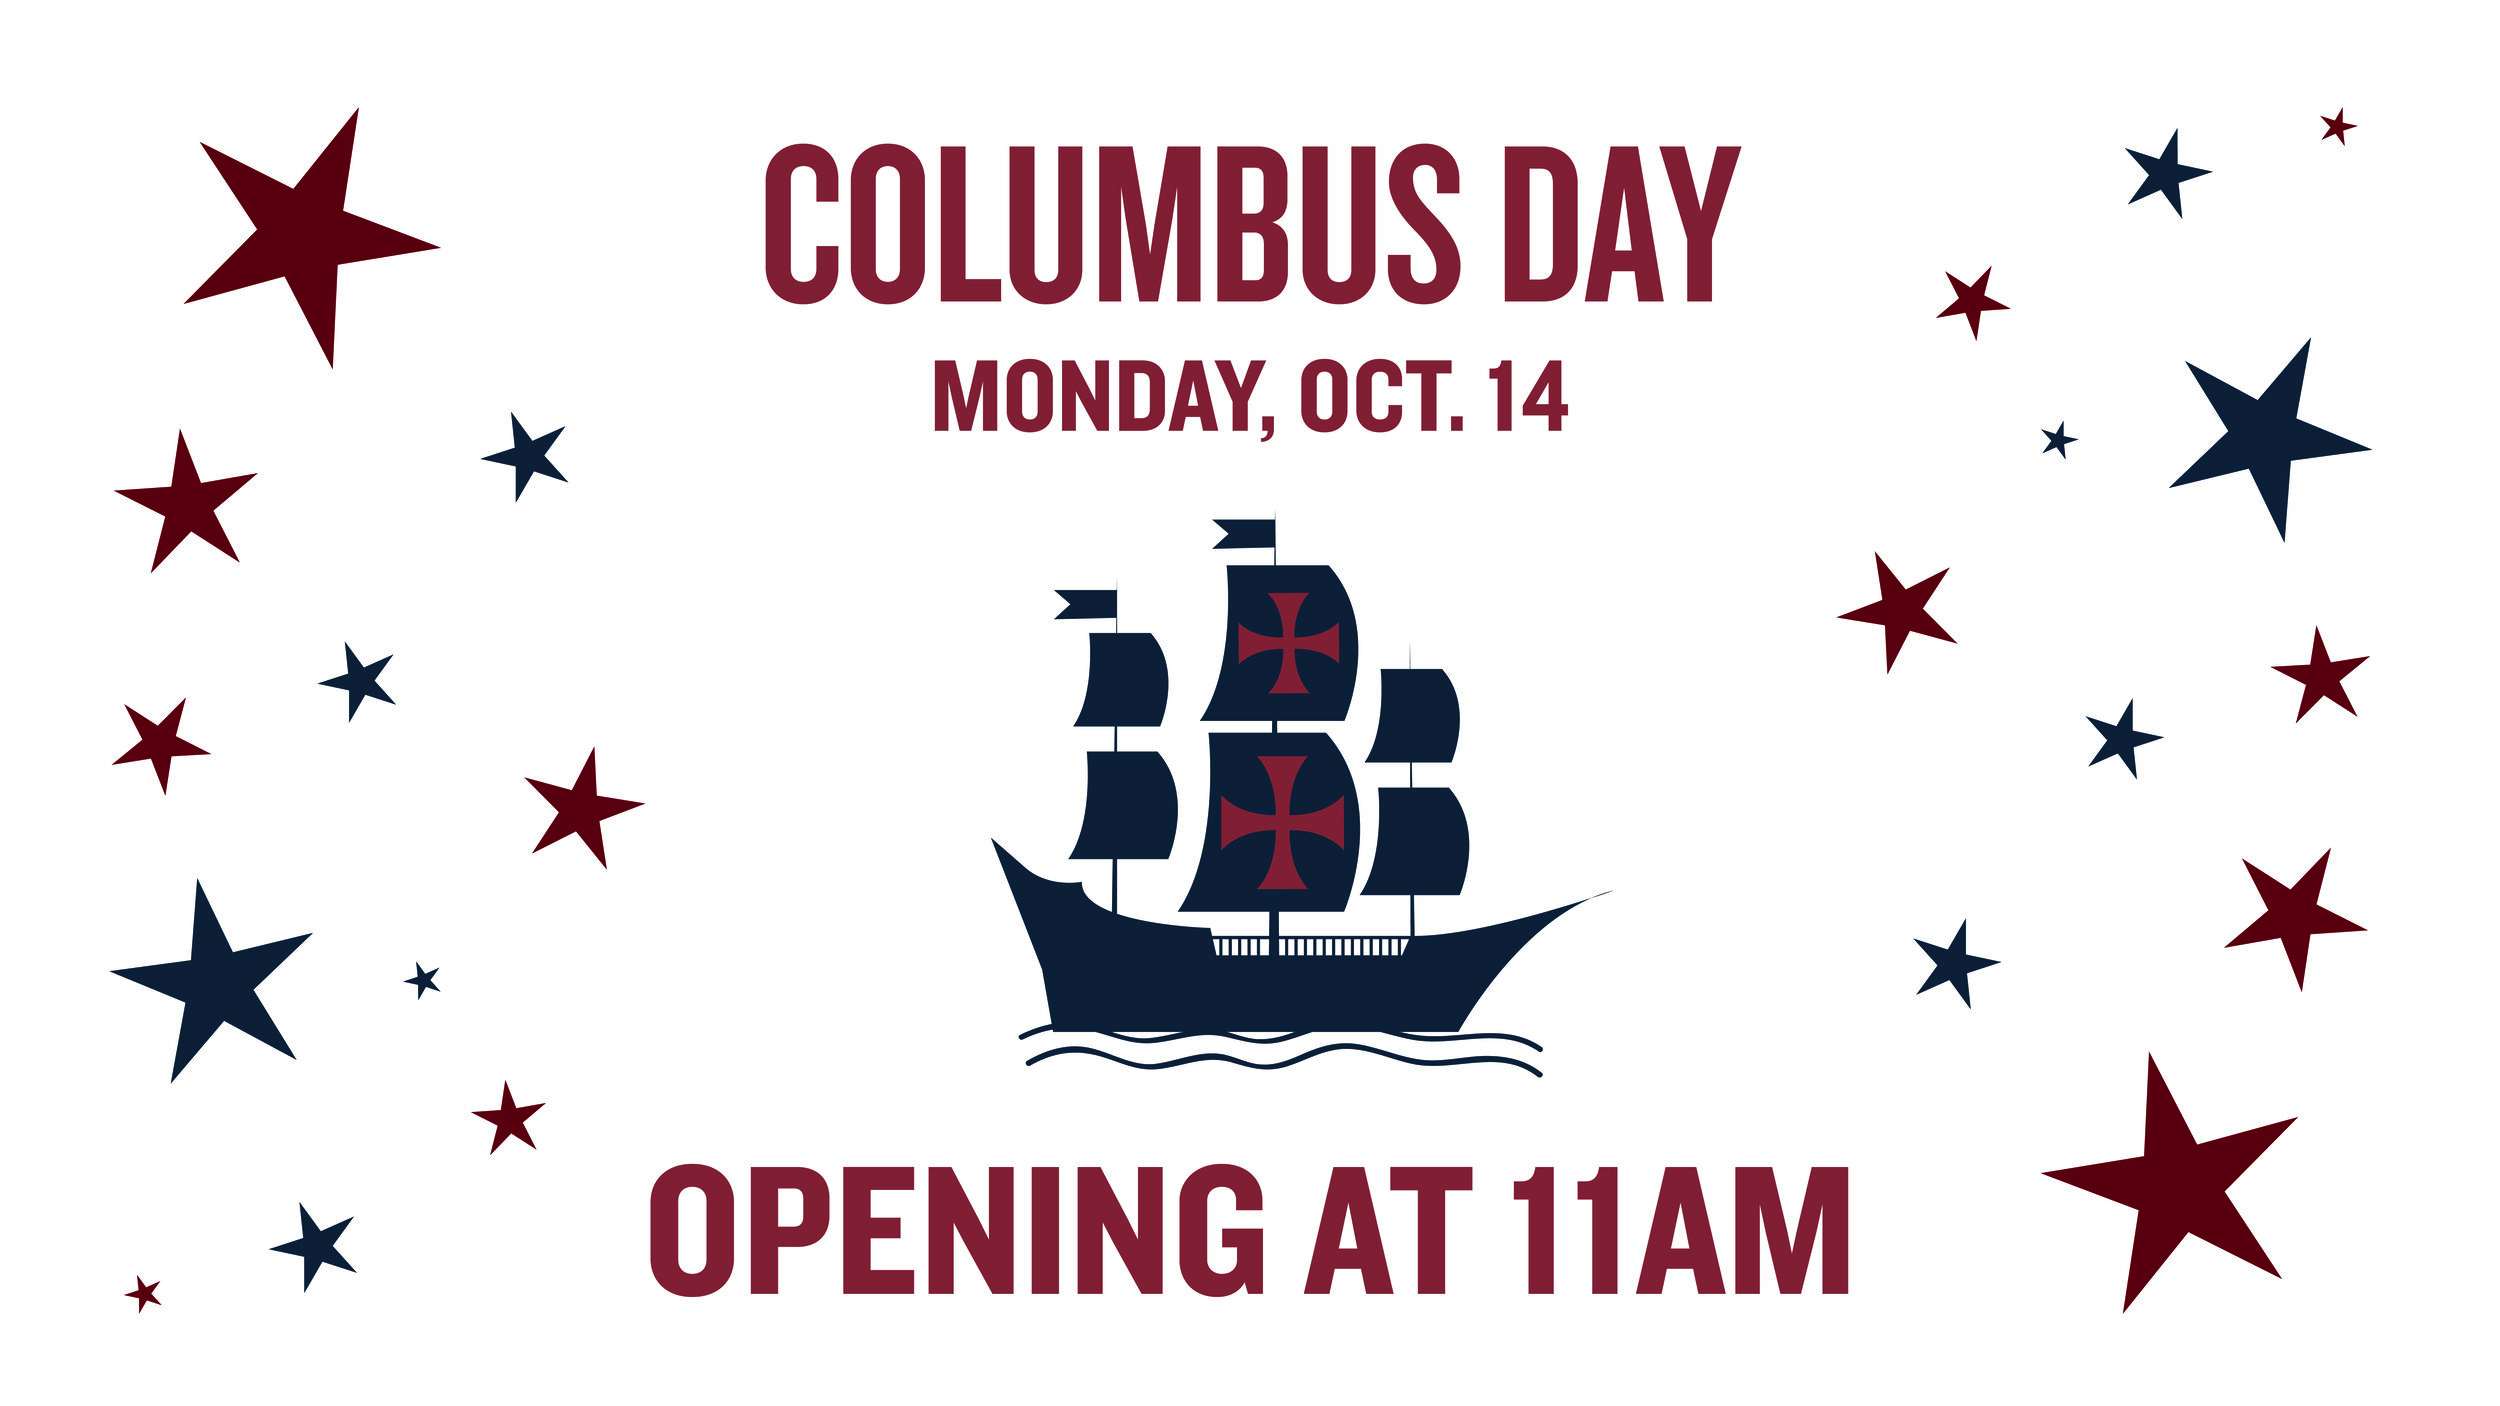 ColumbusDay_facebook-03.jpg